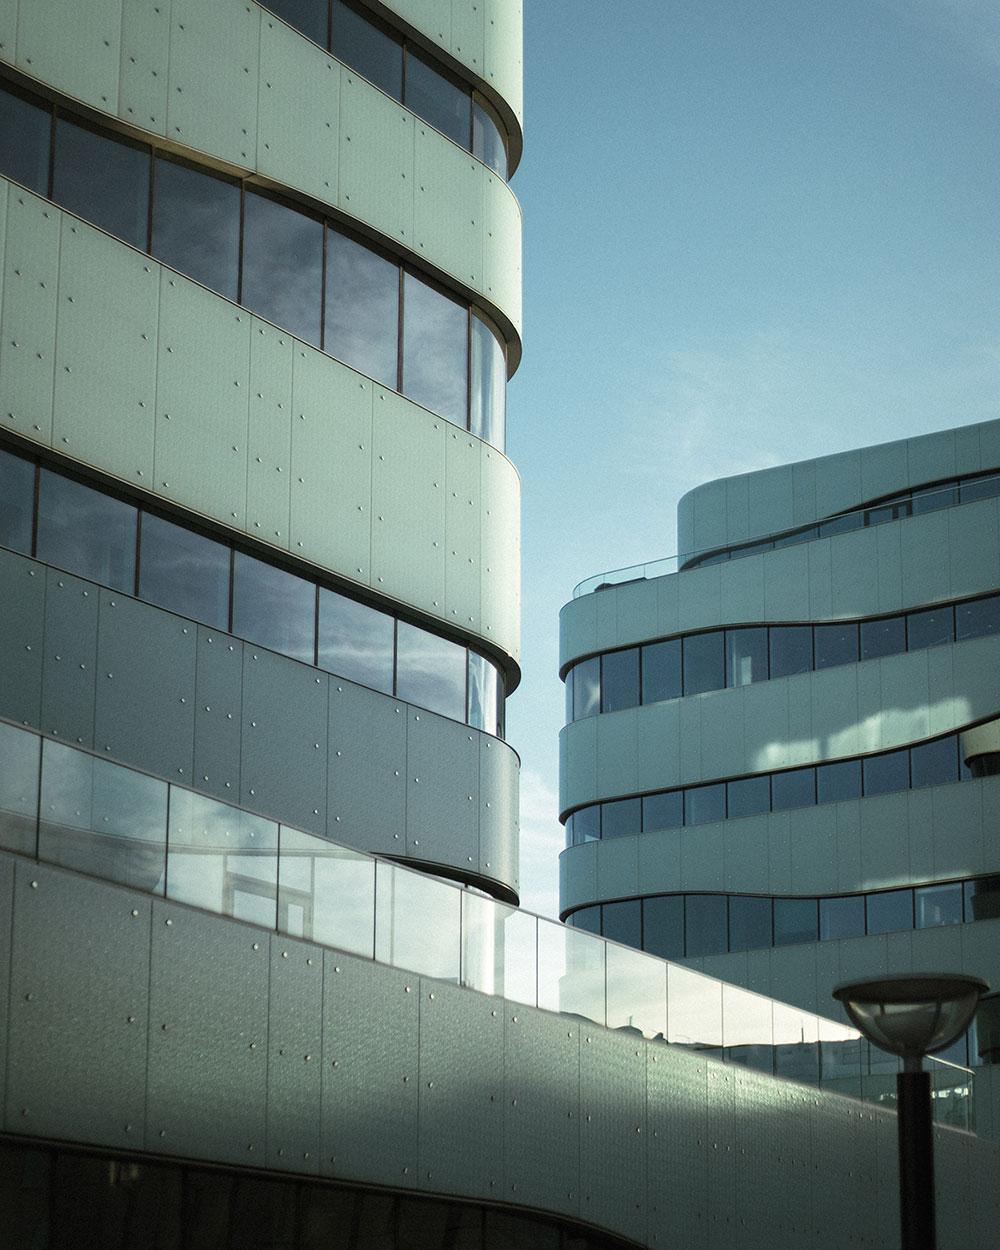 Tower Blocks by Kim Høltermand